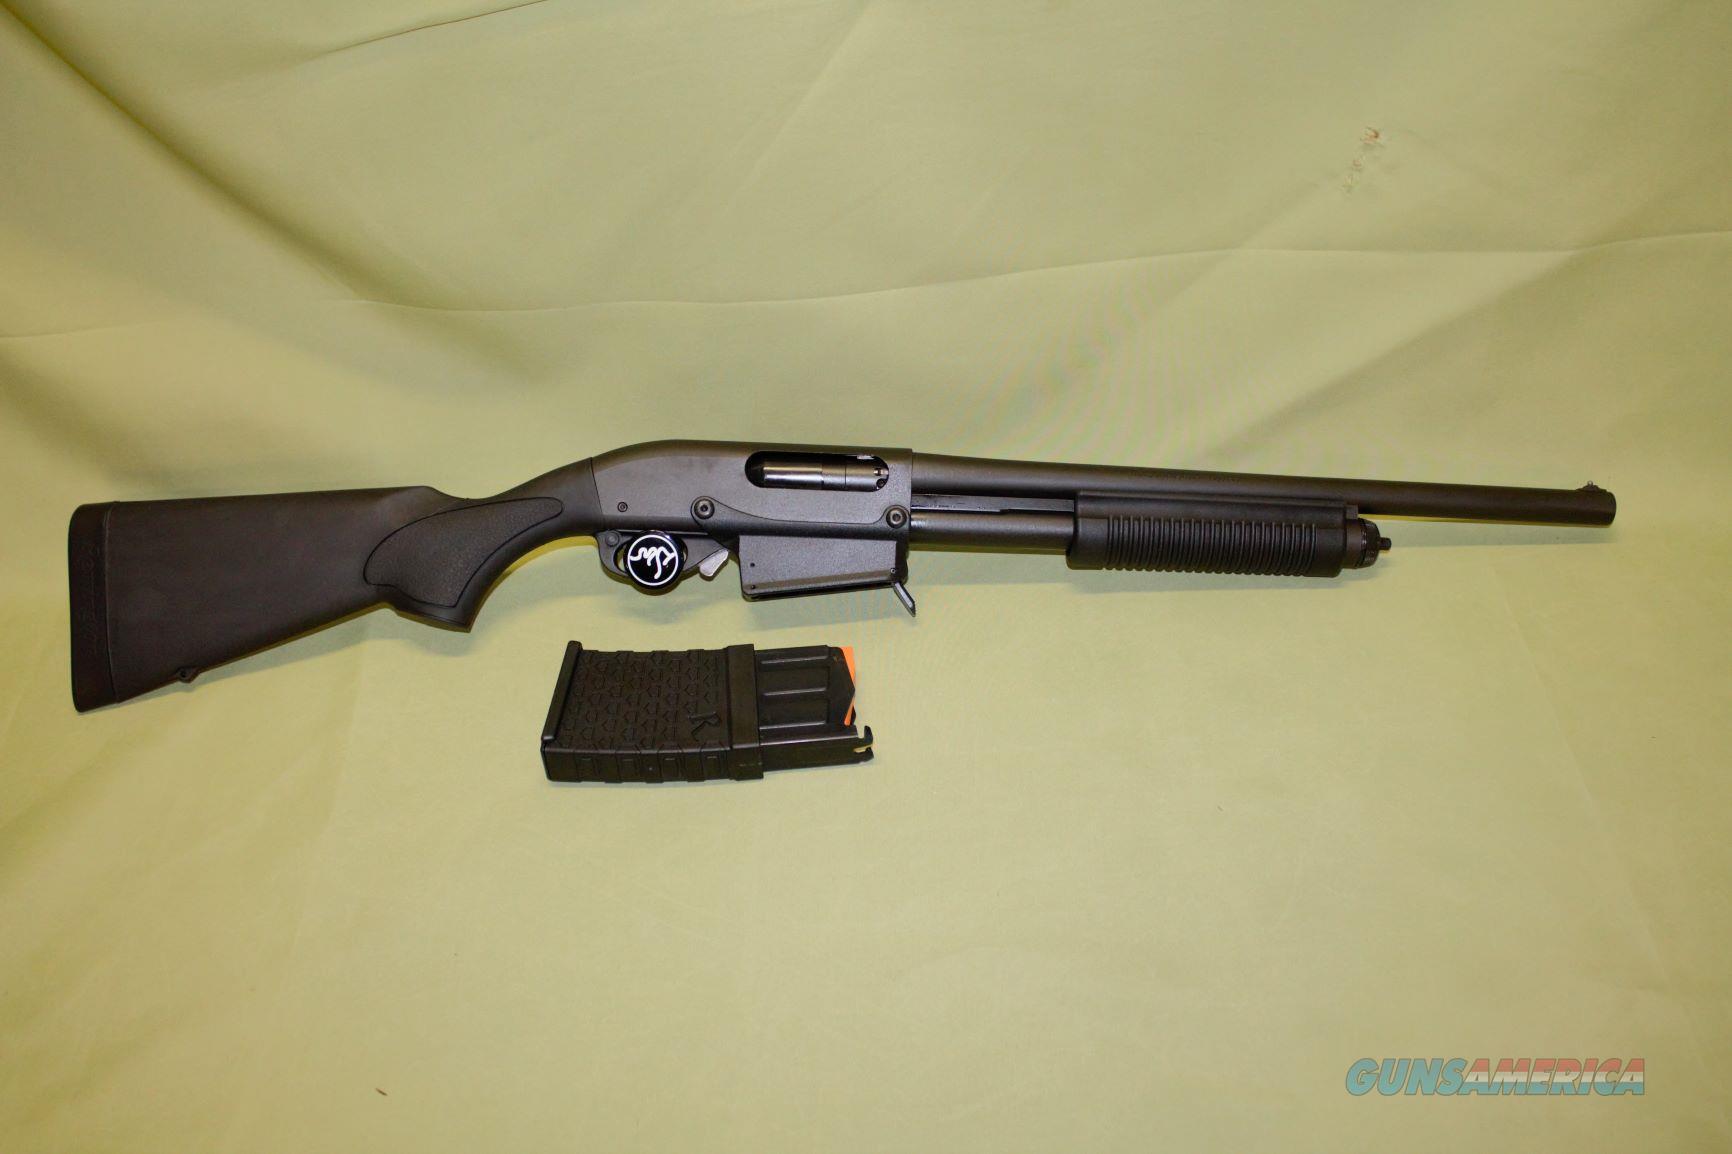 SALE! Remington 870 DM 12 Gauge  Guns > Shotguns > Remington Shotguns  > Pump > Tactical